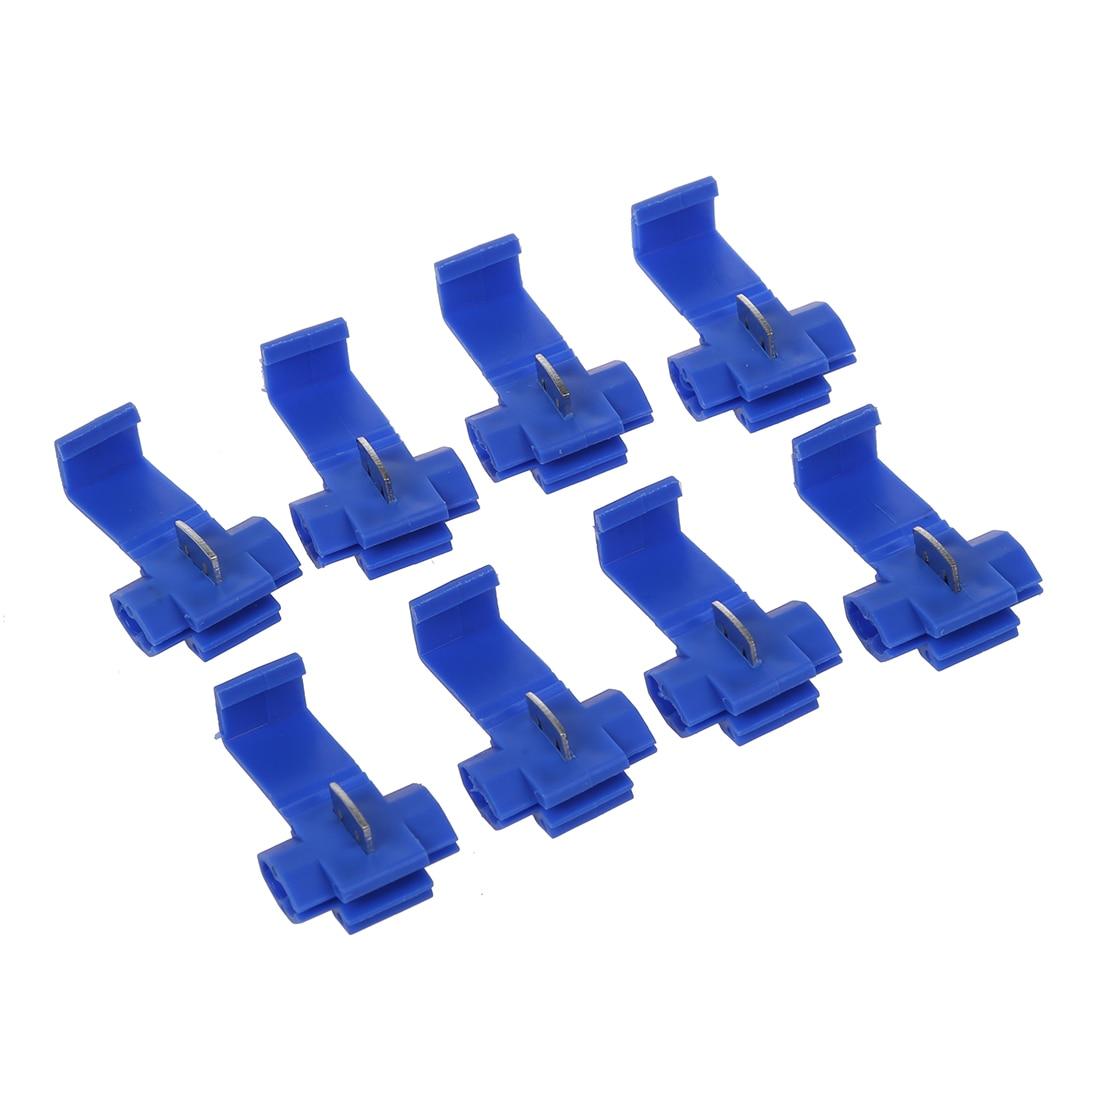 2 PCS 25W 8R Decoding Resistance Band with Line Break Line Snaps